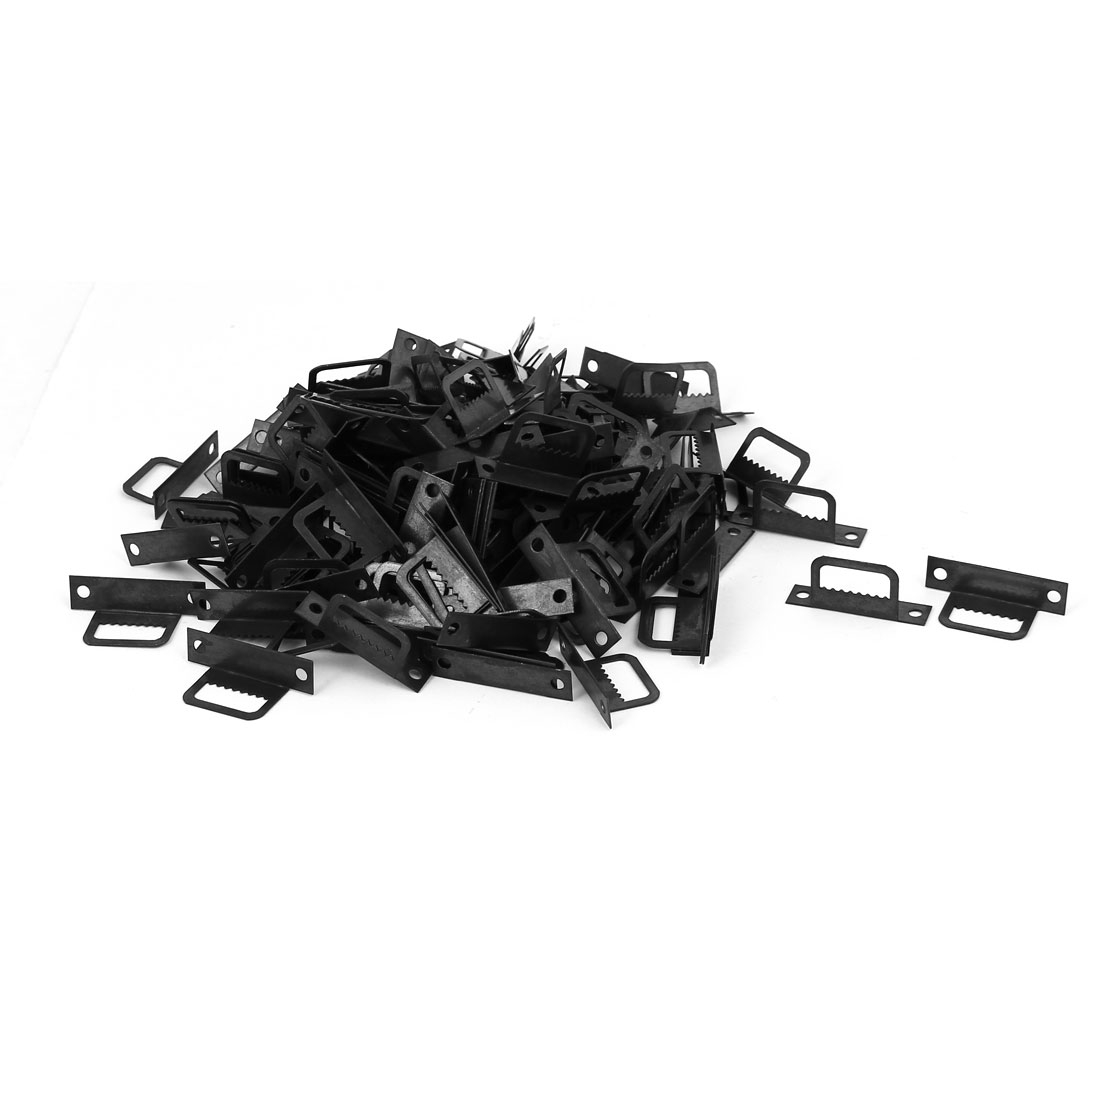 Cross Stitch Picture Frame L Shape Sawtooth Hanger Black 32mmx8mmx15mm 200pcs